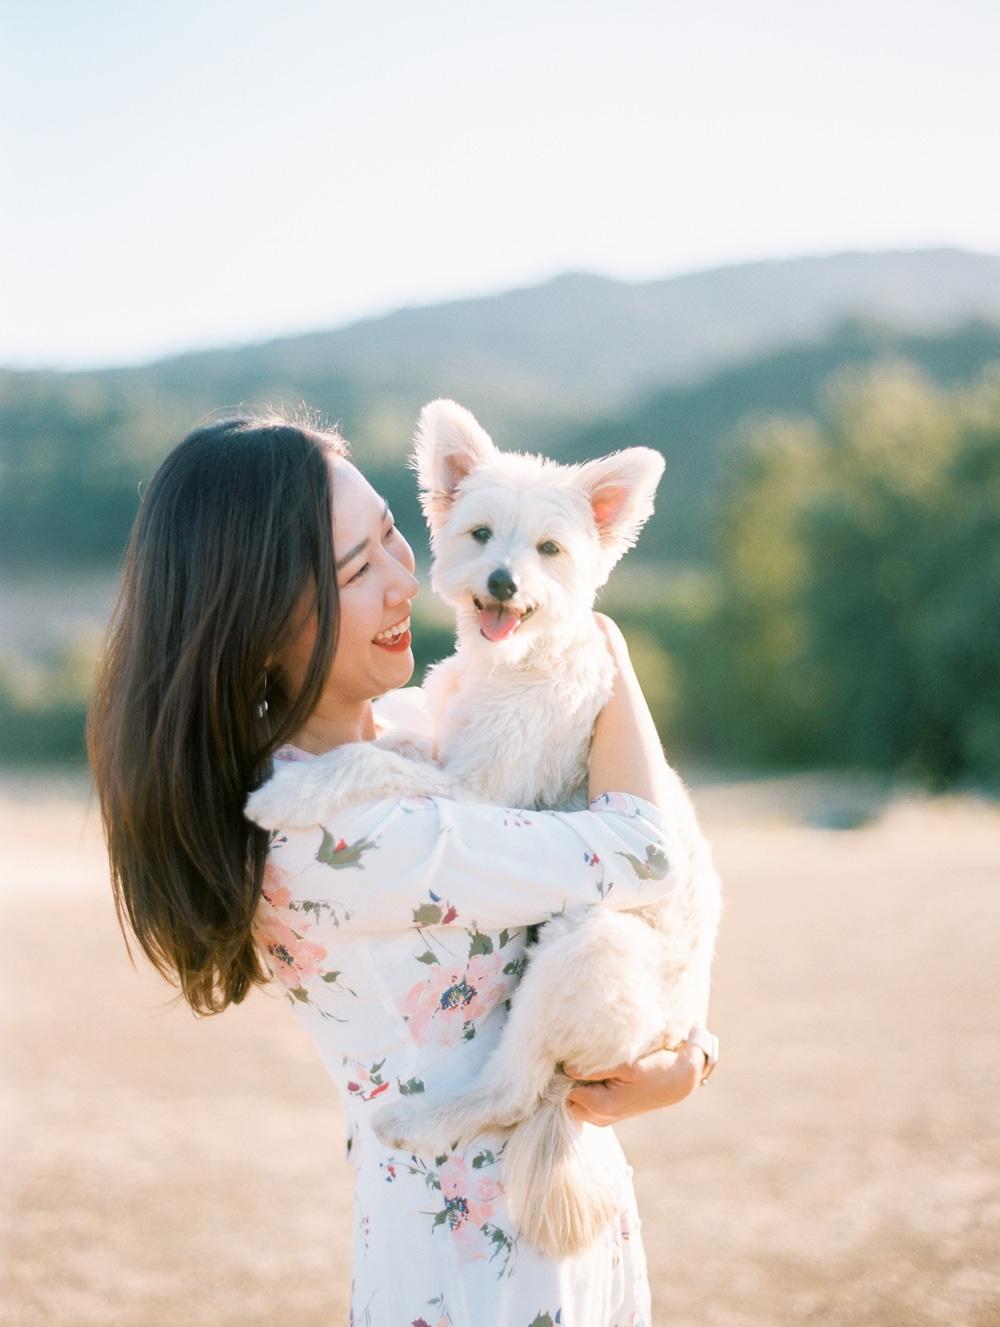 Kristin-La-Voie-Photography-california-wedding-photographer-dog-session-rancho-san-antonio-los-altos-1